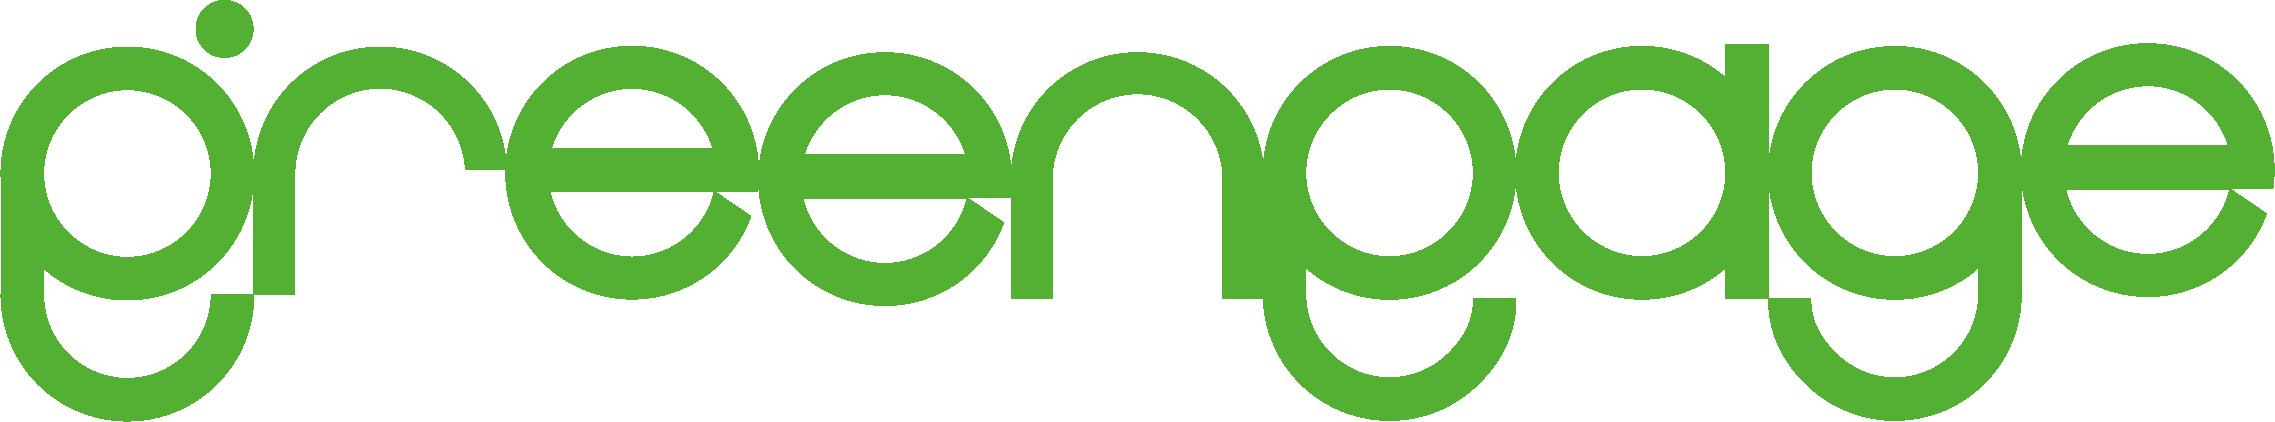 Greengage Digital